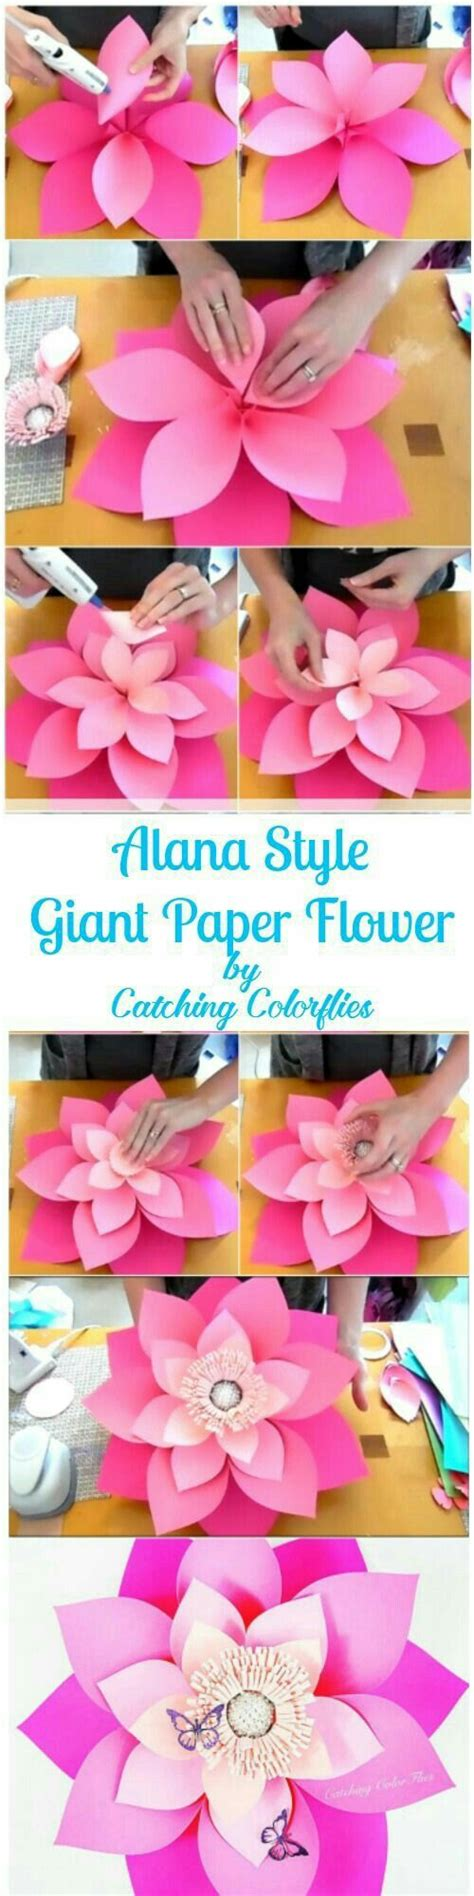 hawaiian paper flower tutorial 1822 best images about diy flowers on pinterest felt